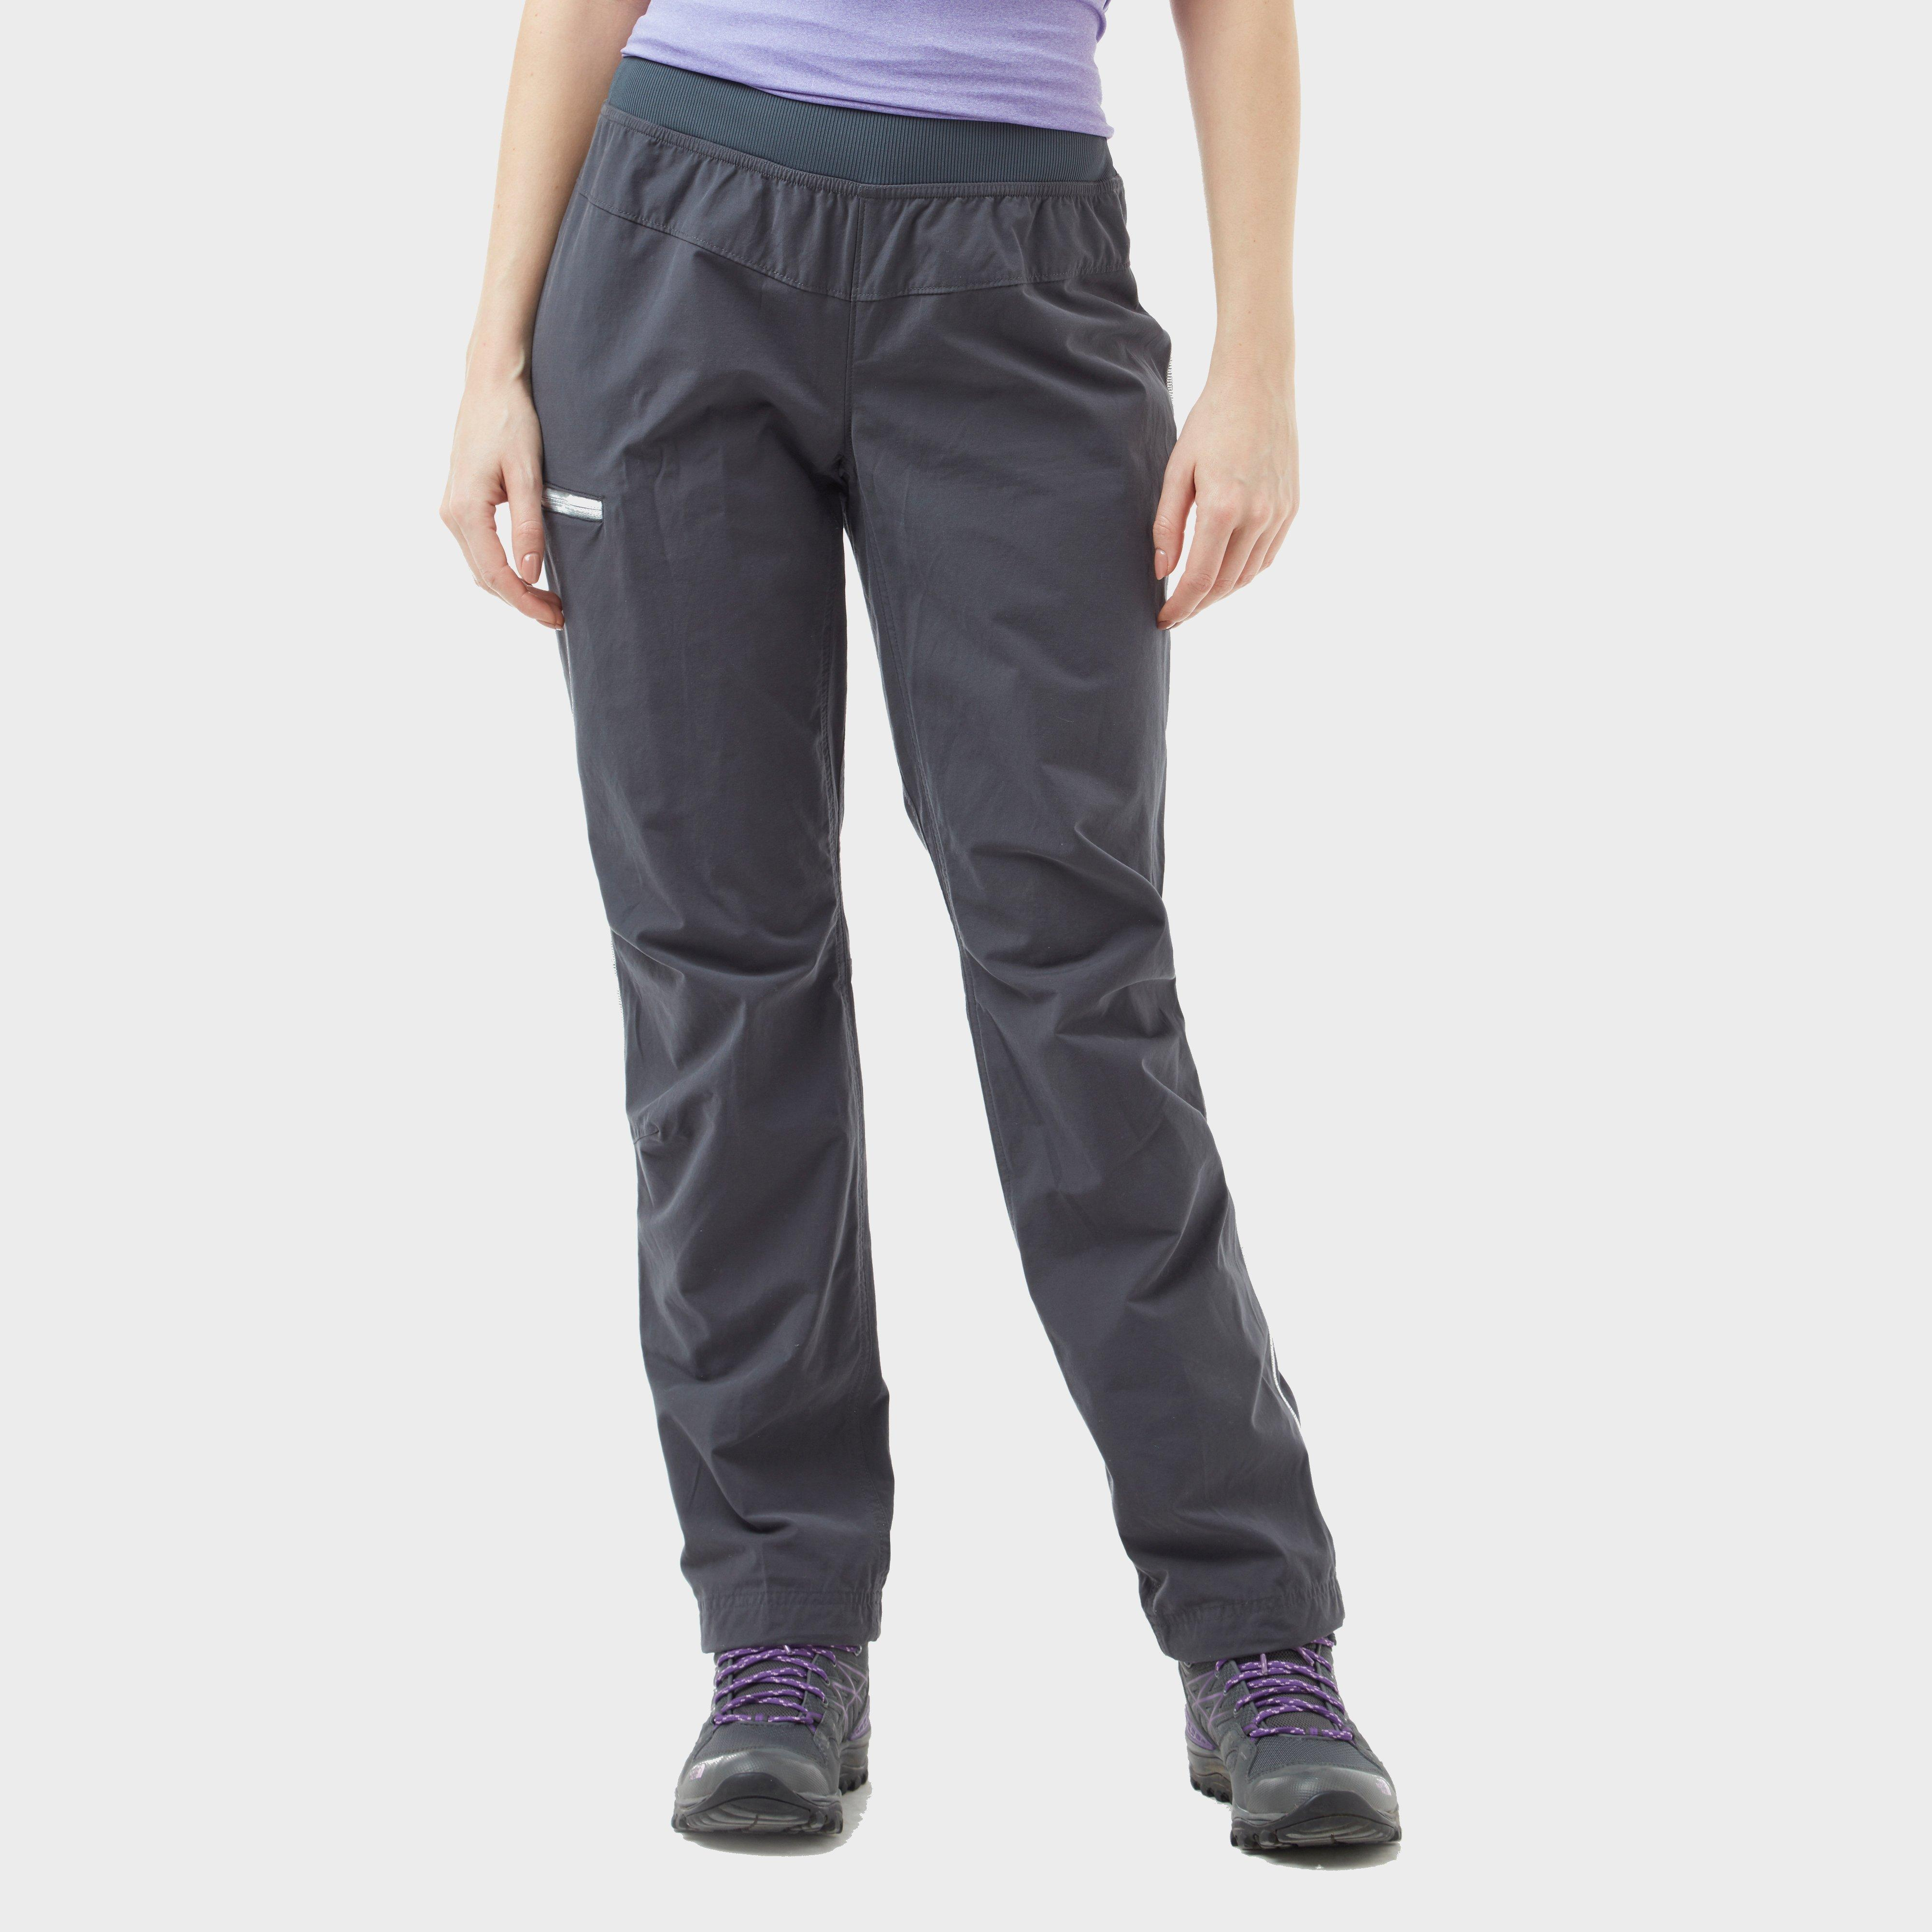 Marmot Women's Dihedral Pants, Grey